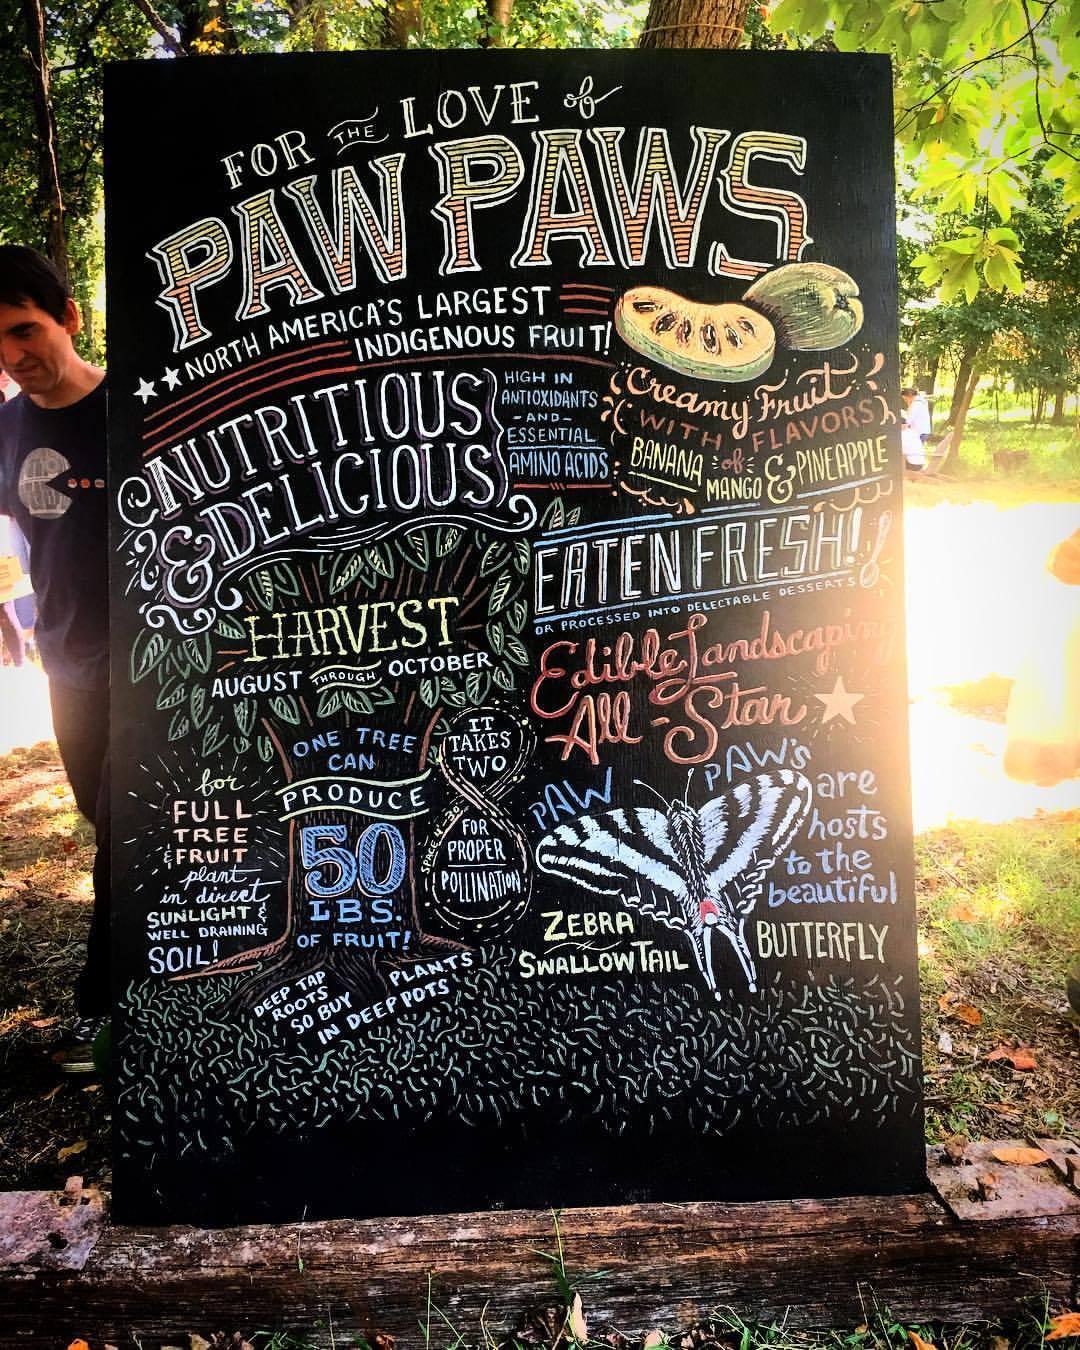 pawpaw